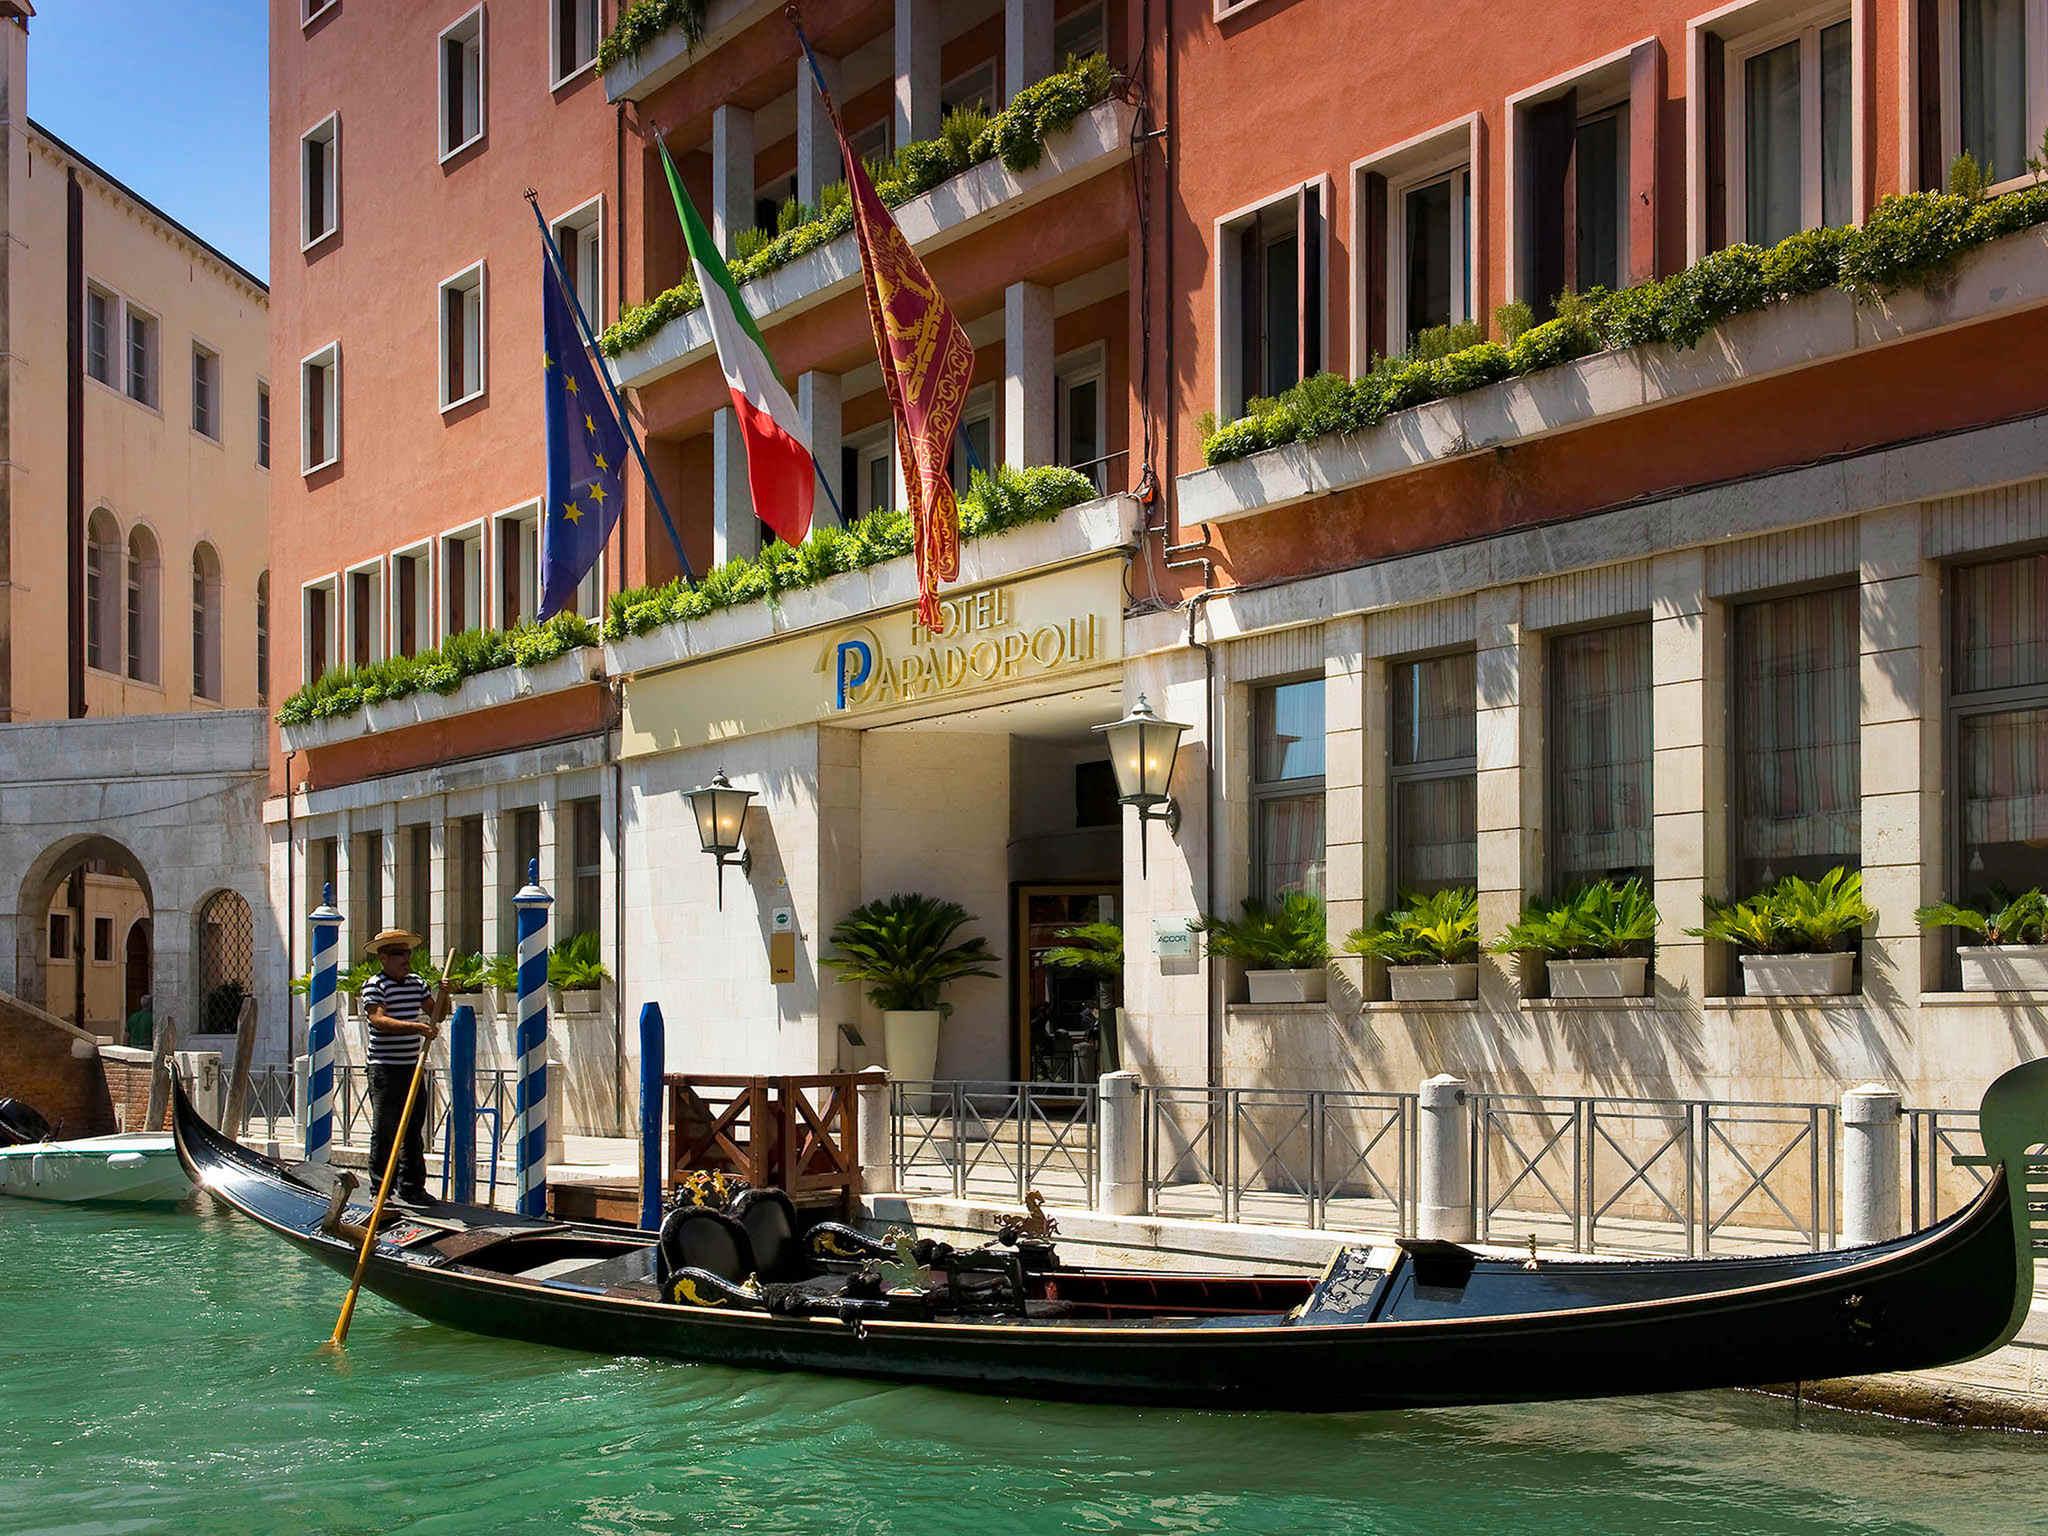 Hotel hotel papadopoli venezia mgallery by sofitel